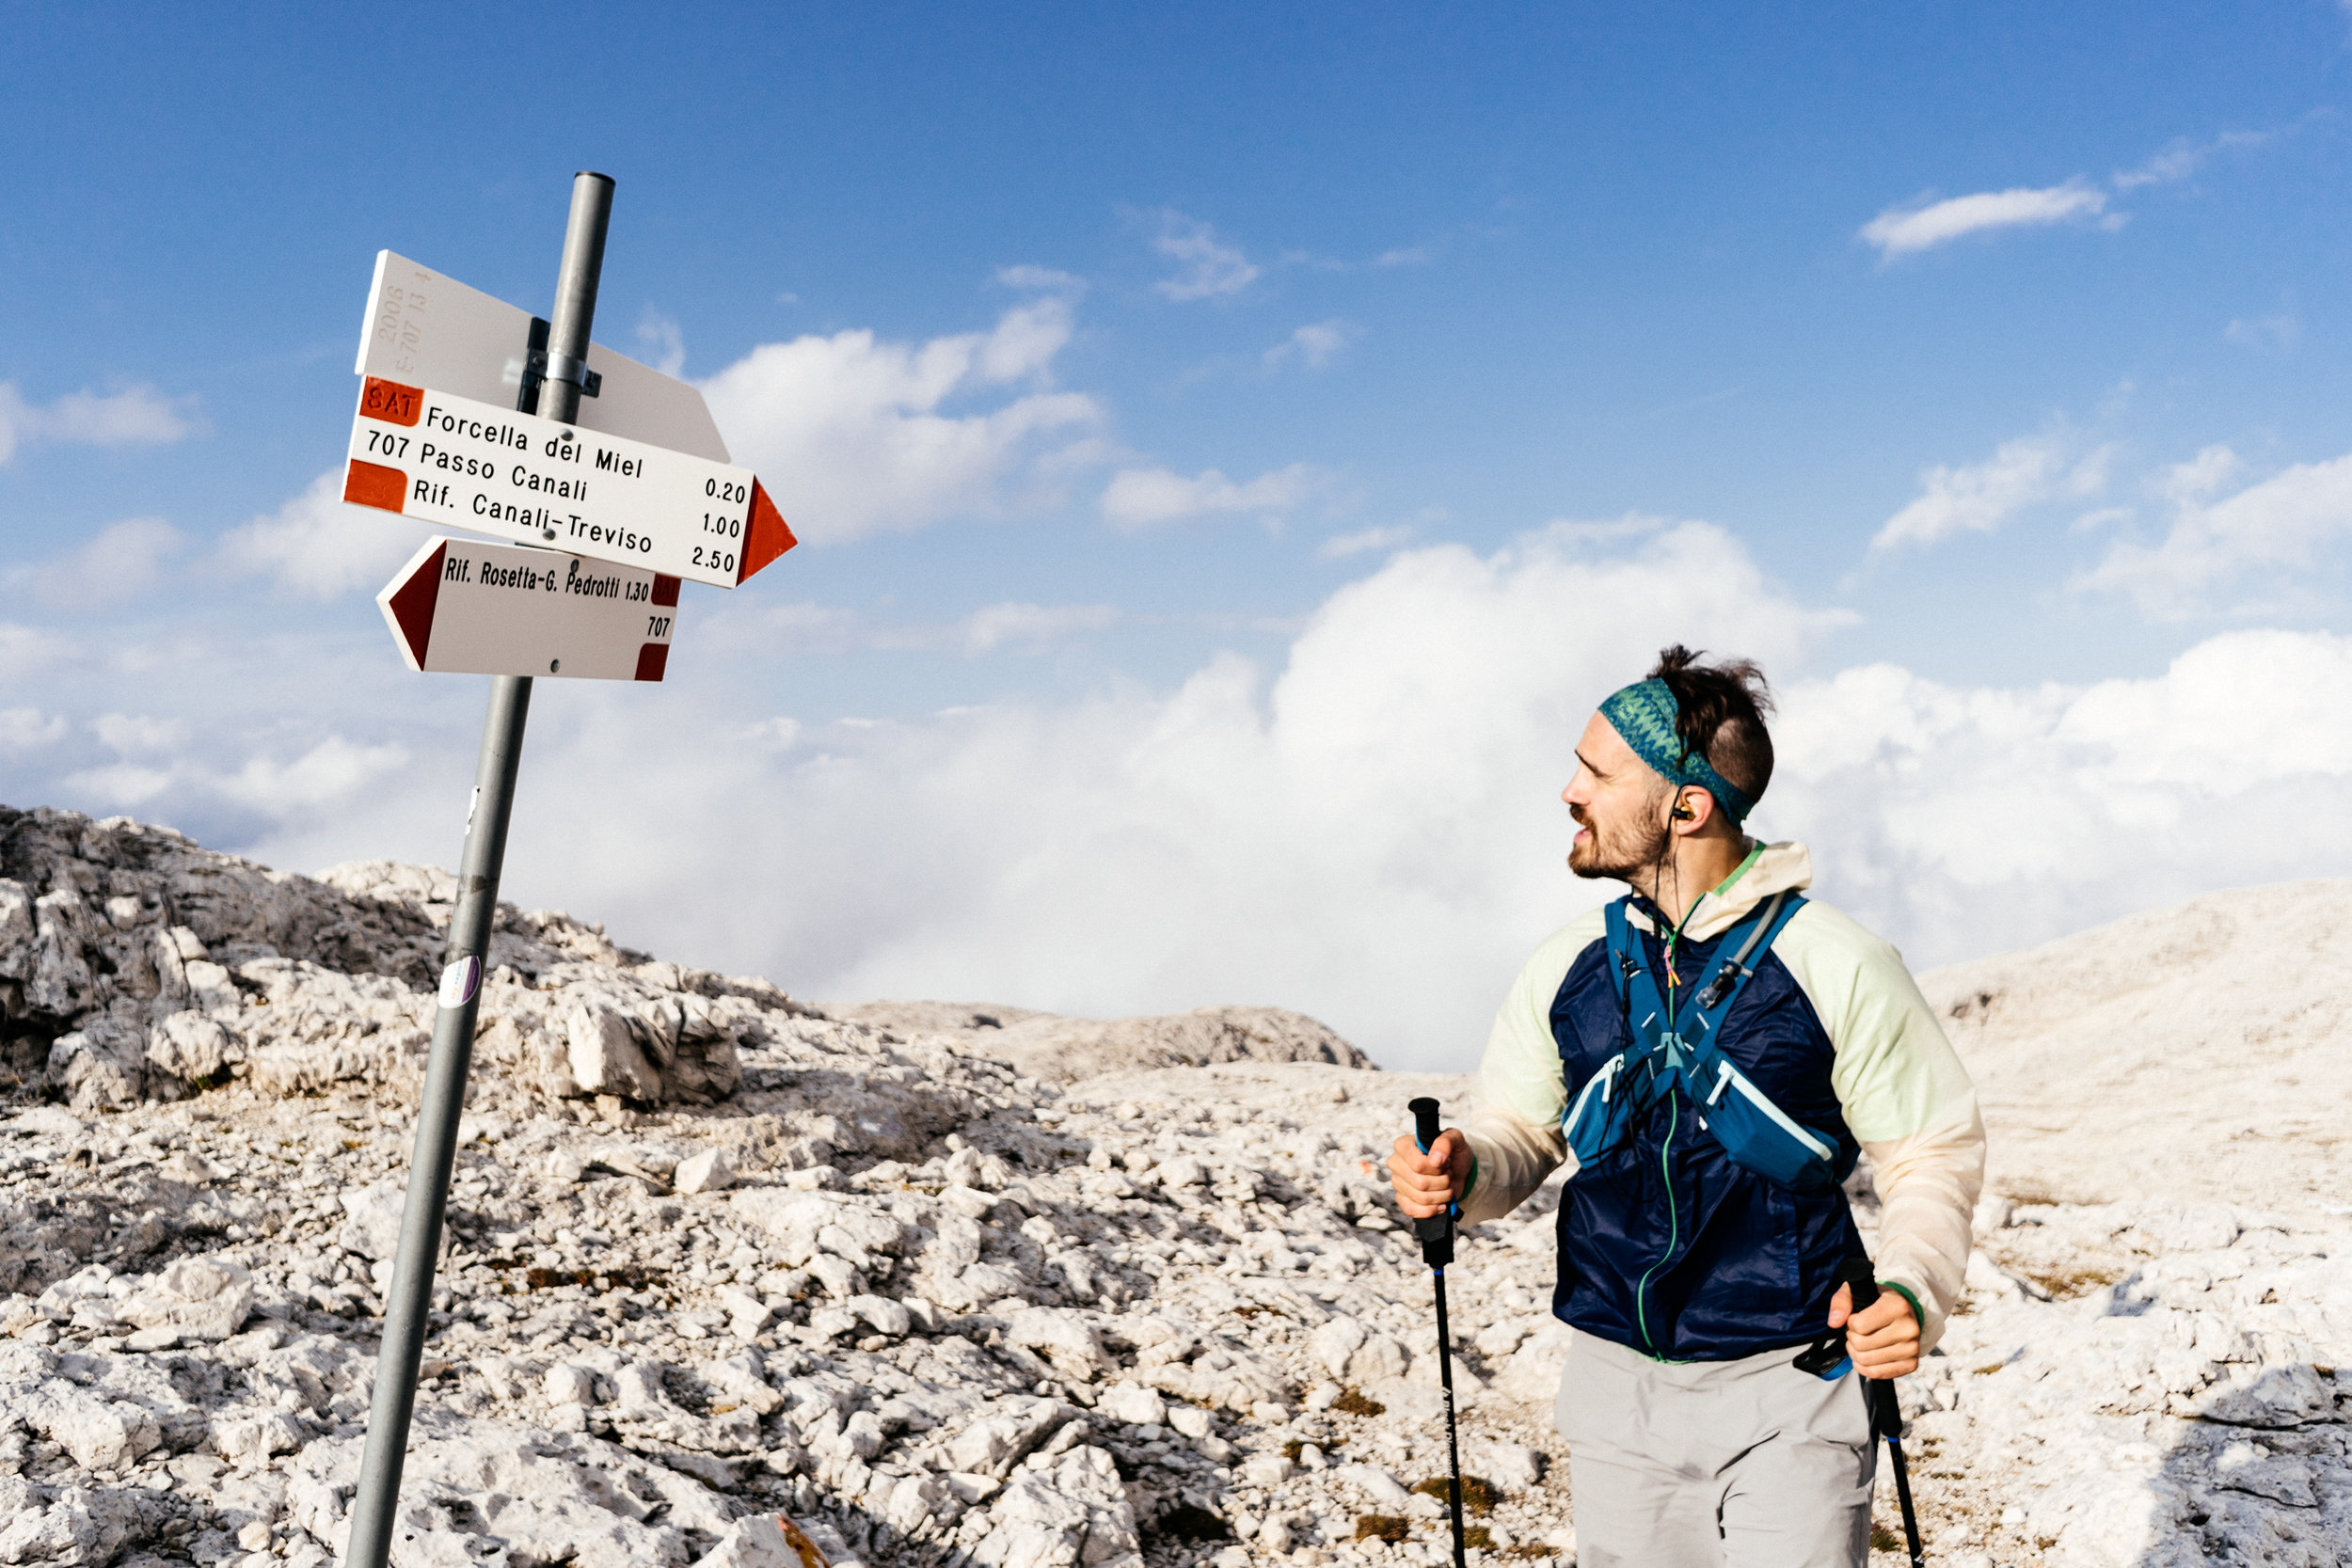 Dolomites-ChrisBrinleeJr-SEP17-61.jpg